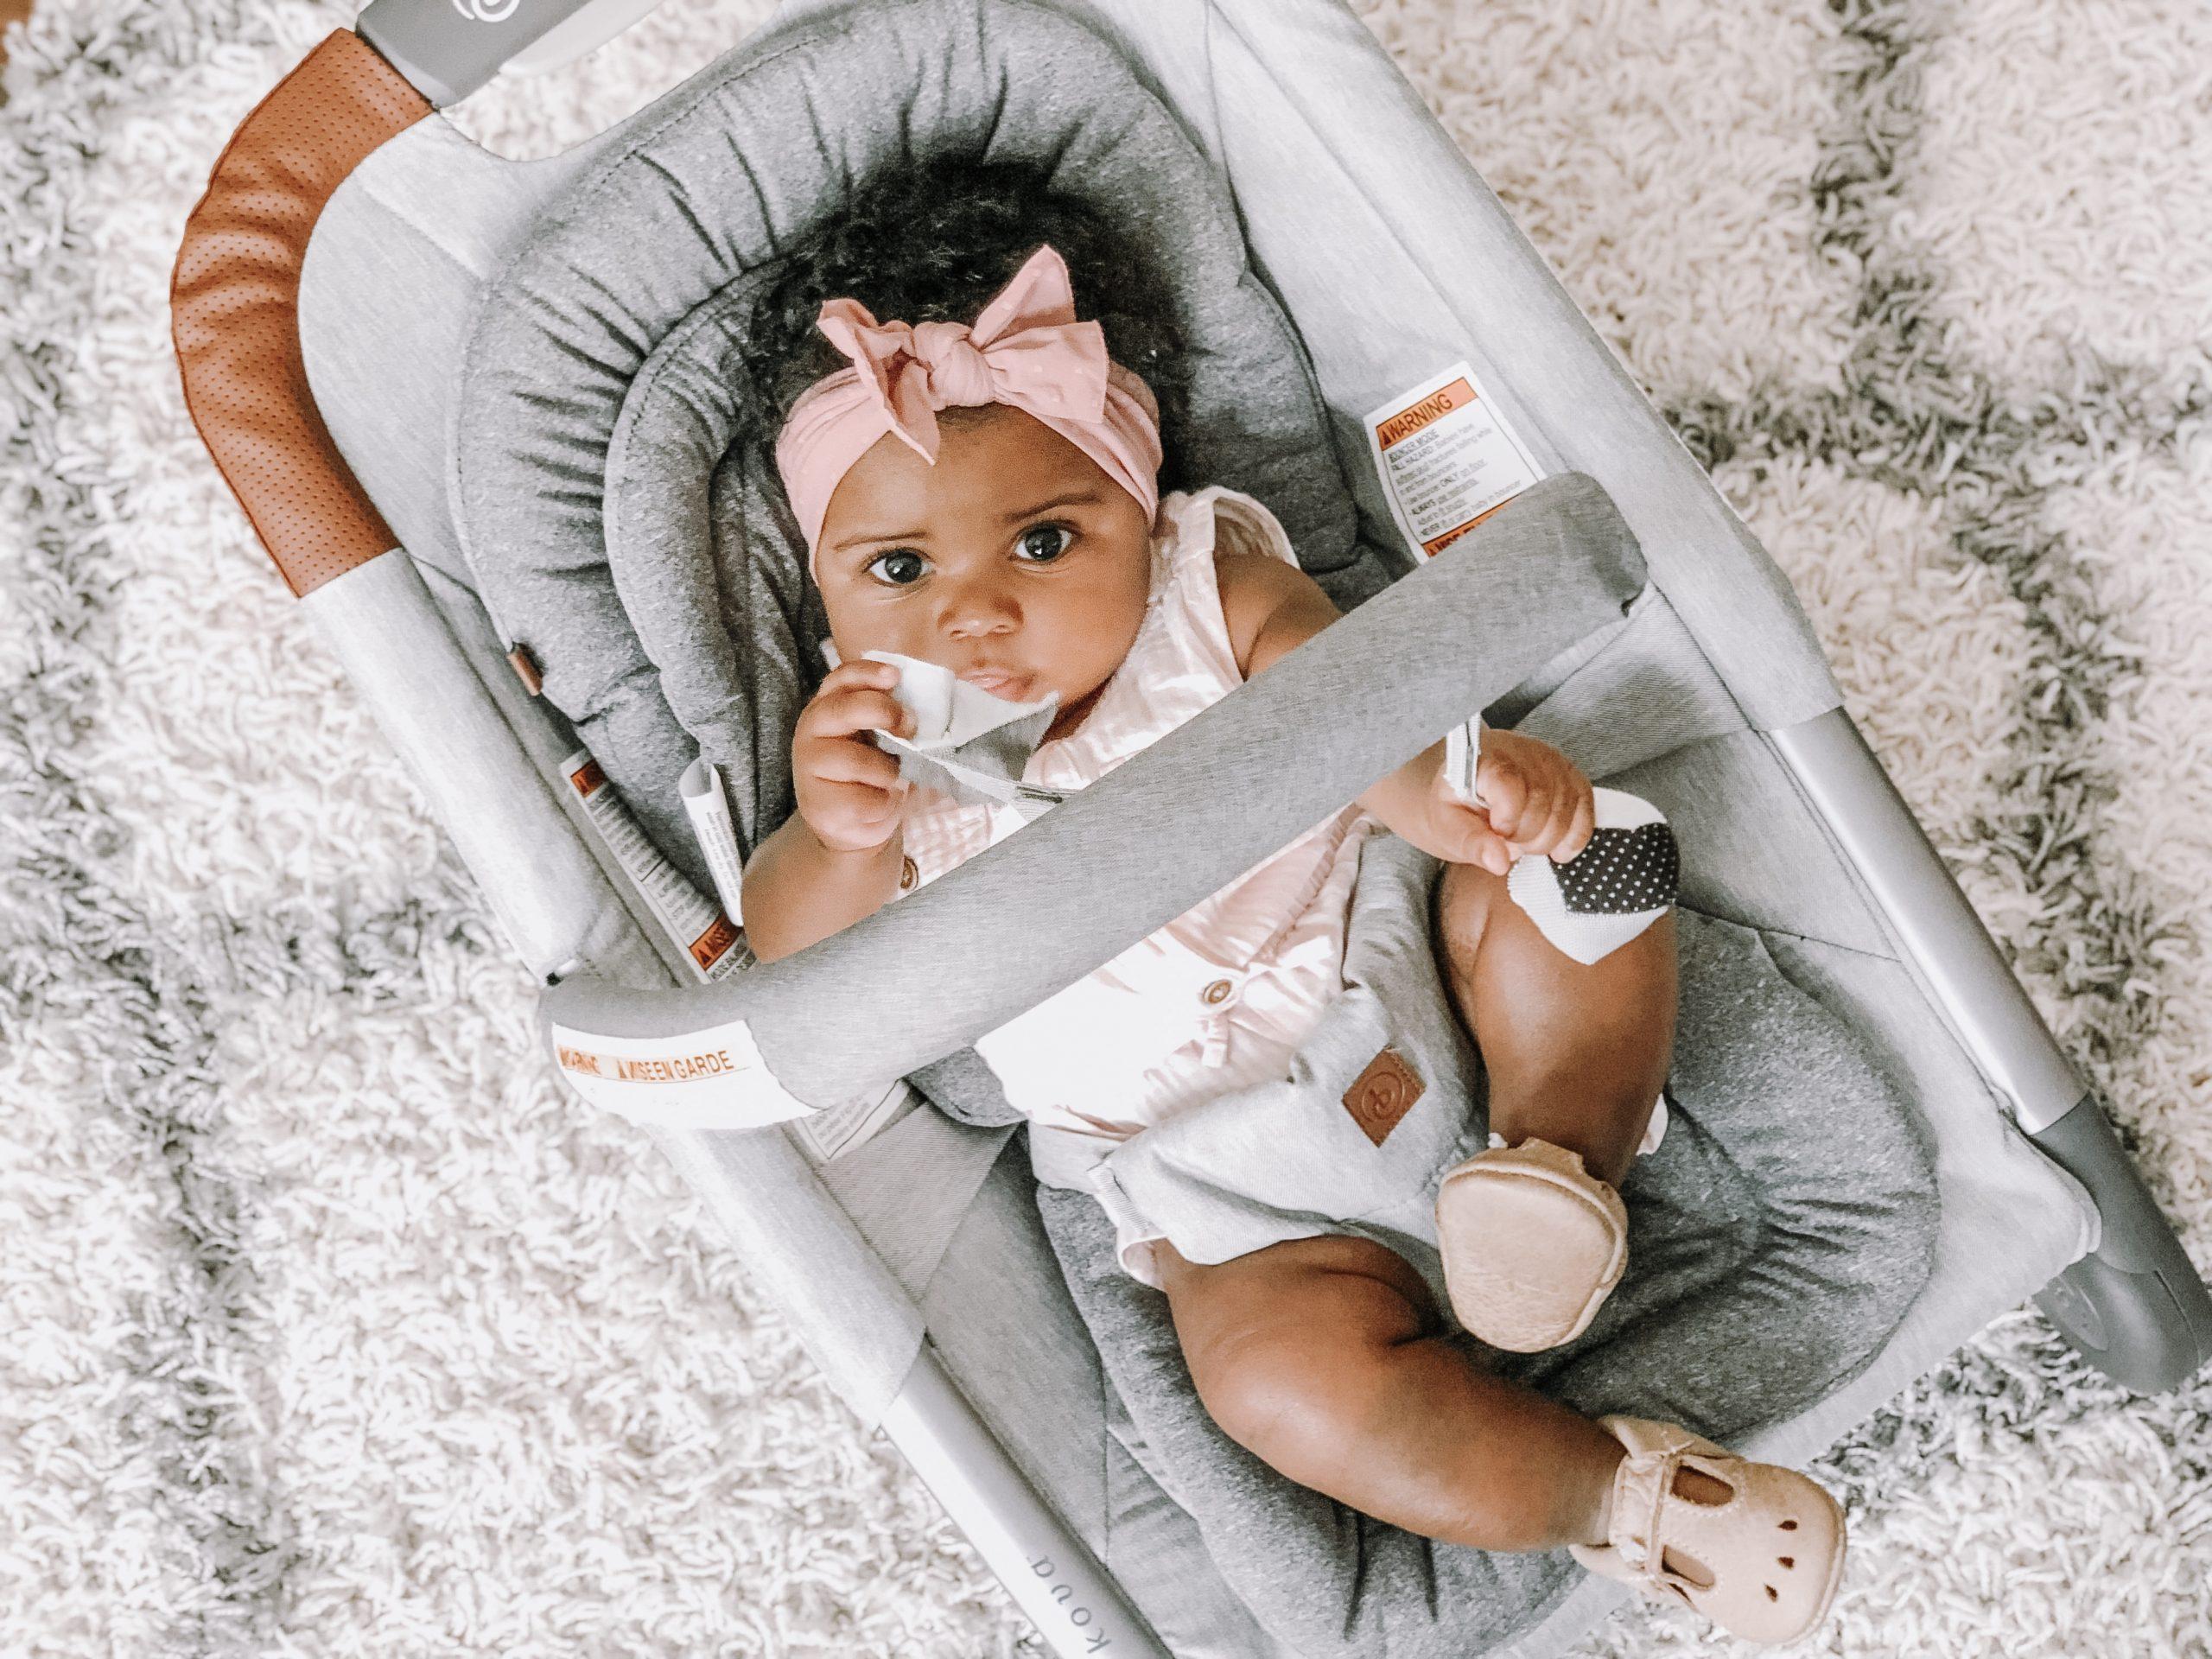 Mommyhood Joy Blog baby development product recommendations